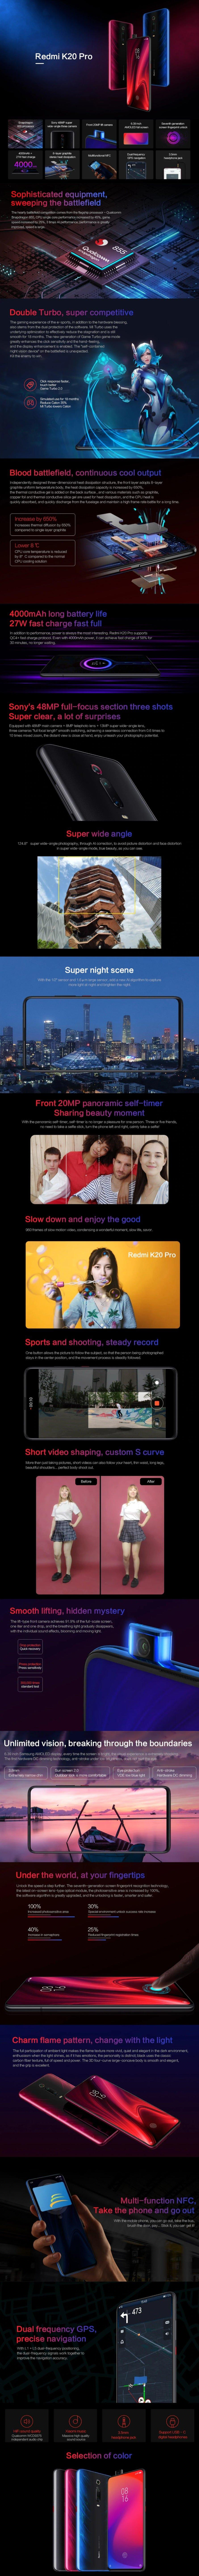 Black Friday Sale - Xiaomi Redmi K20 Pro 4G Phablet